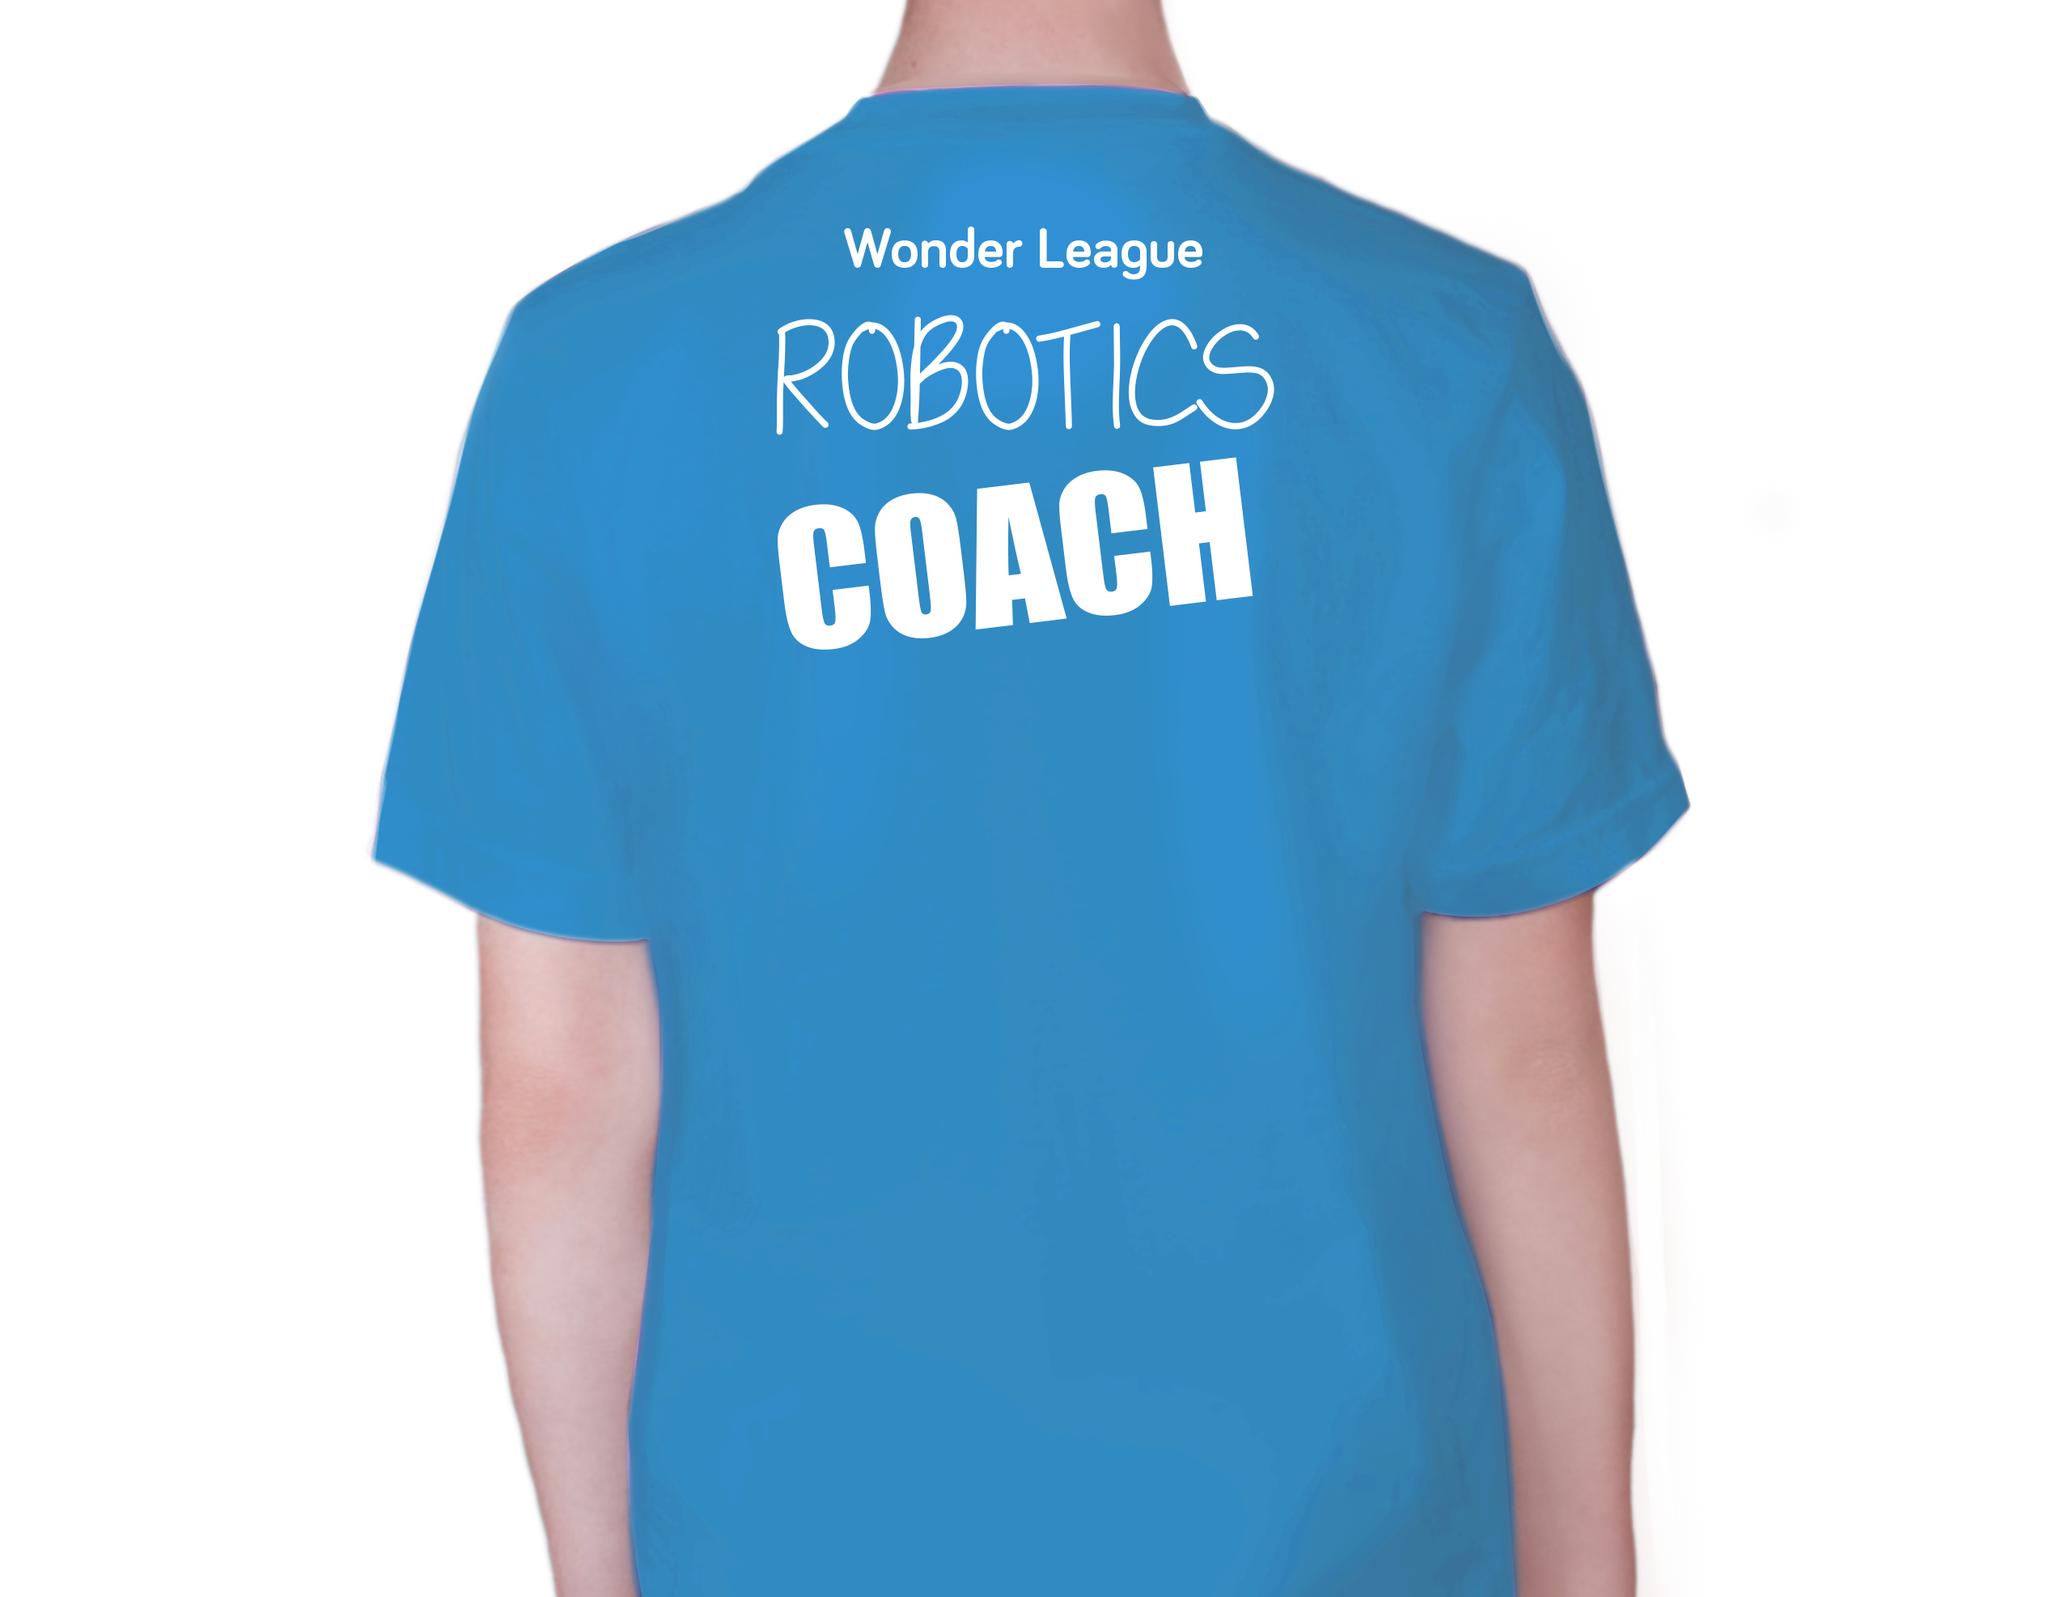 Wonder League Club T Shirt Logics Academy